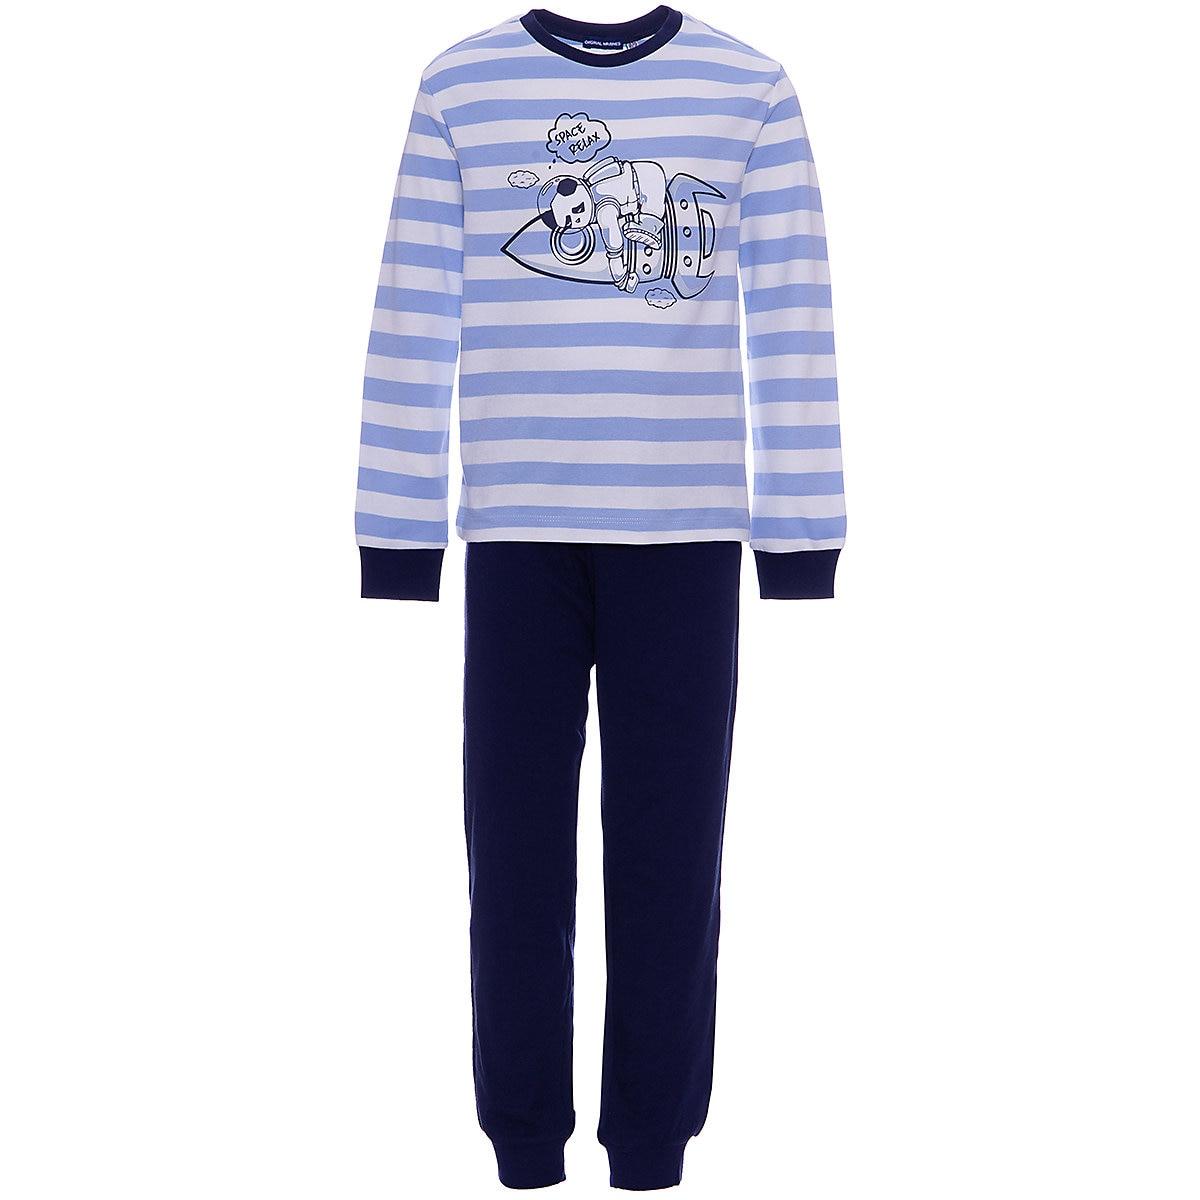 ORIGINAL MARINES Pajama Sets 9500790 Cotton Boys childrens clothing Sleepwear Robe parrot print cami pajama set with robe